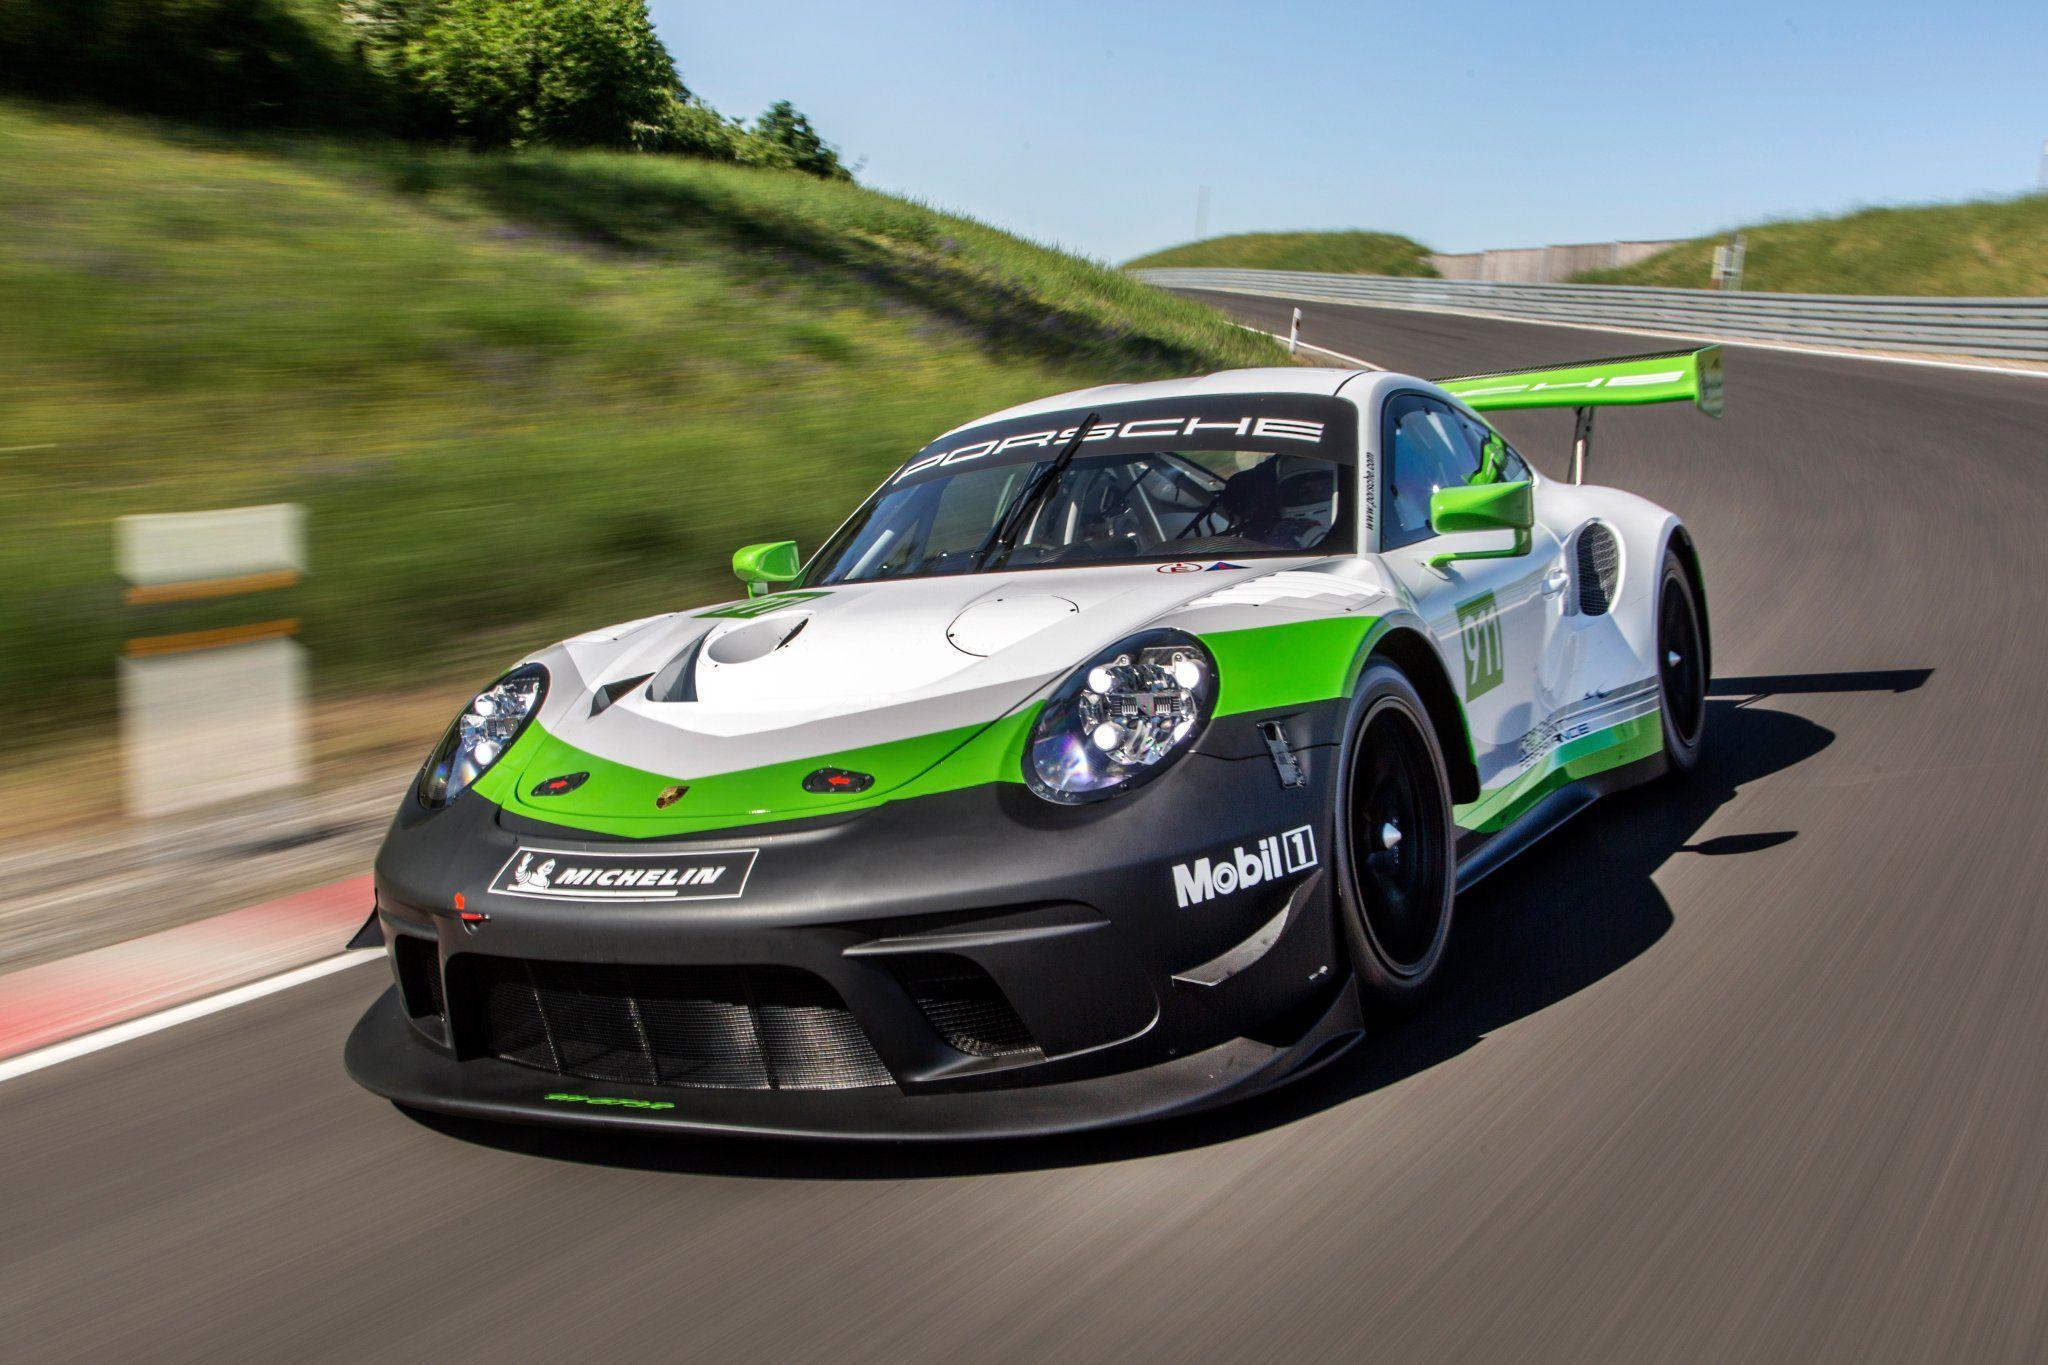 Porsche Motorsport On Twitter Porsche 911 Gt3 Porsche 911 Porsche Gt3